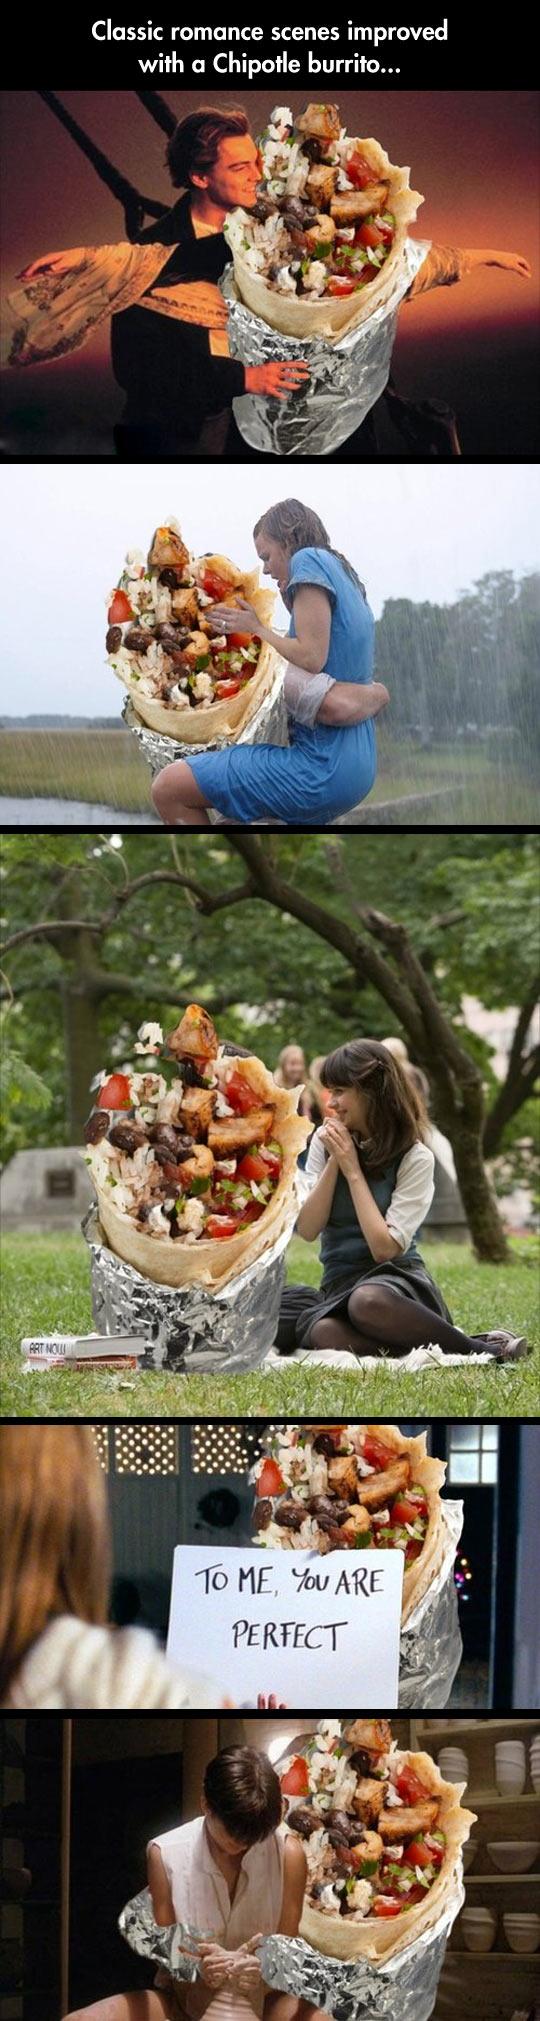 Burrito Romance